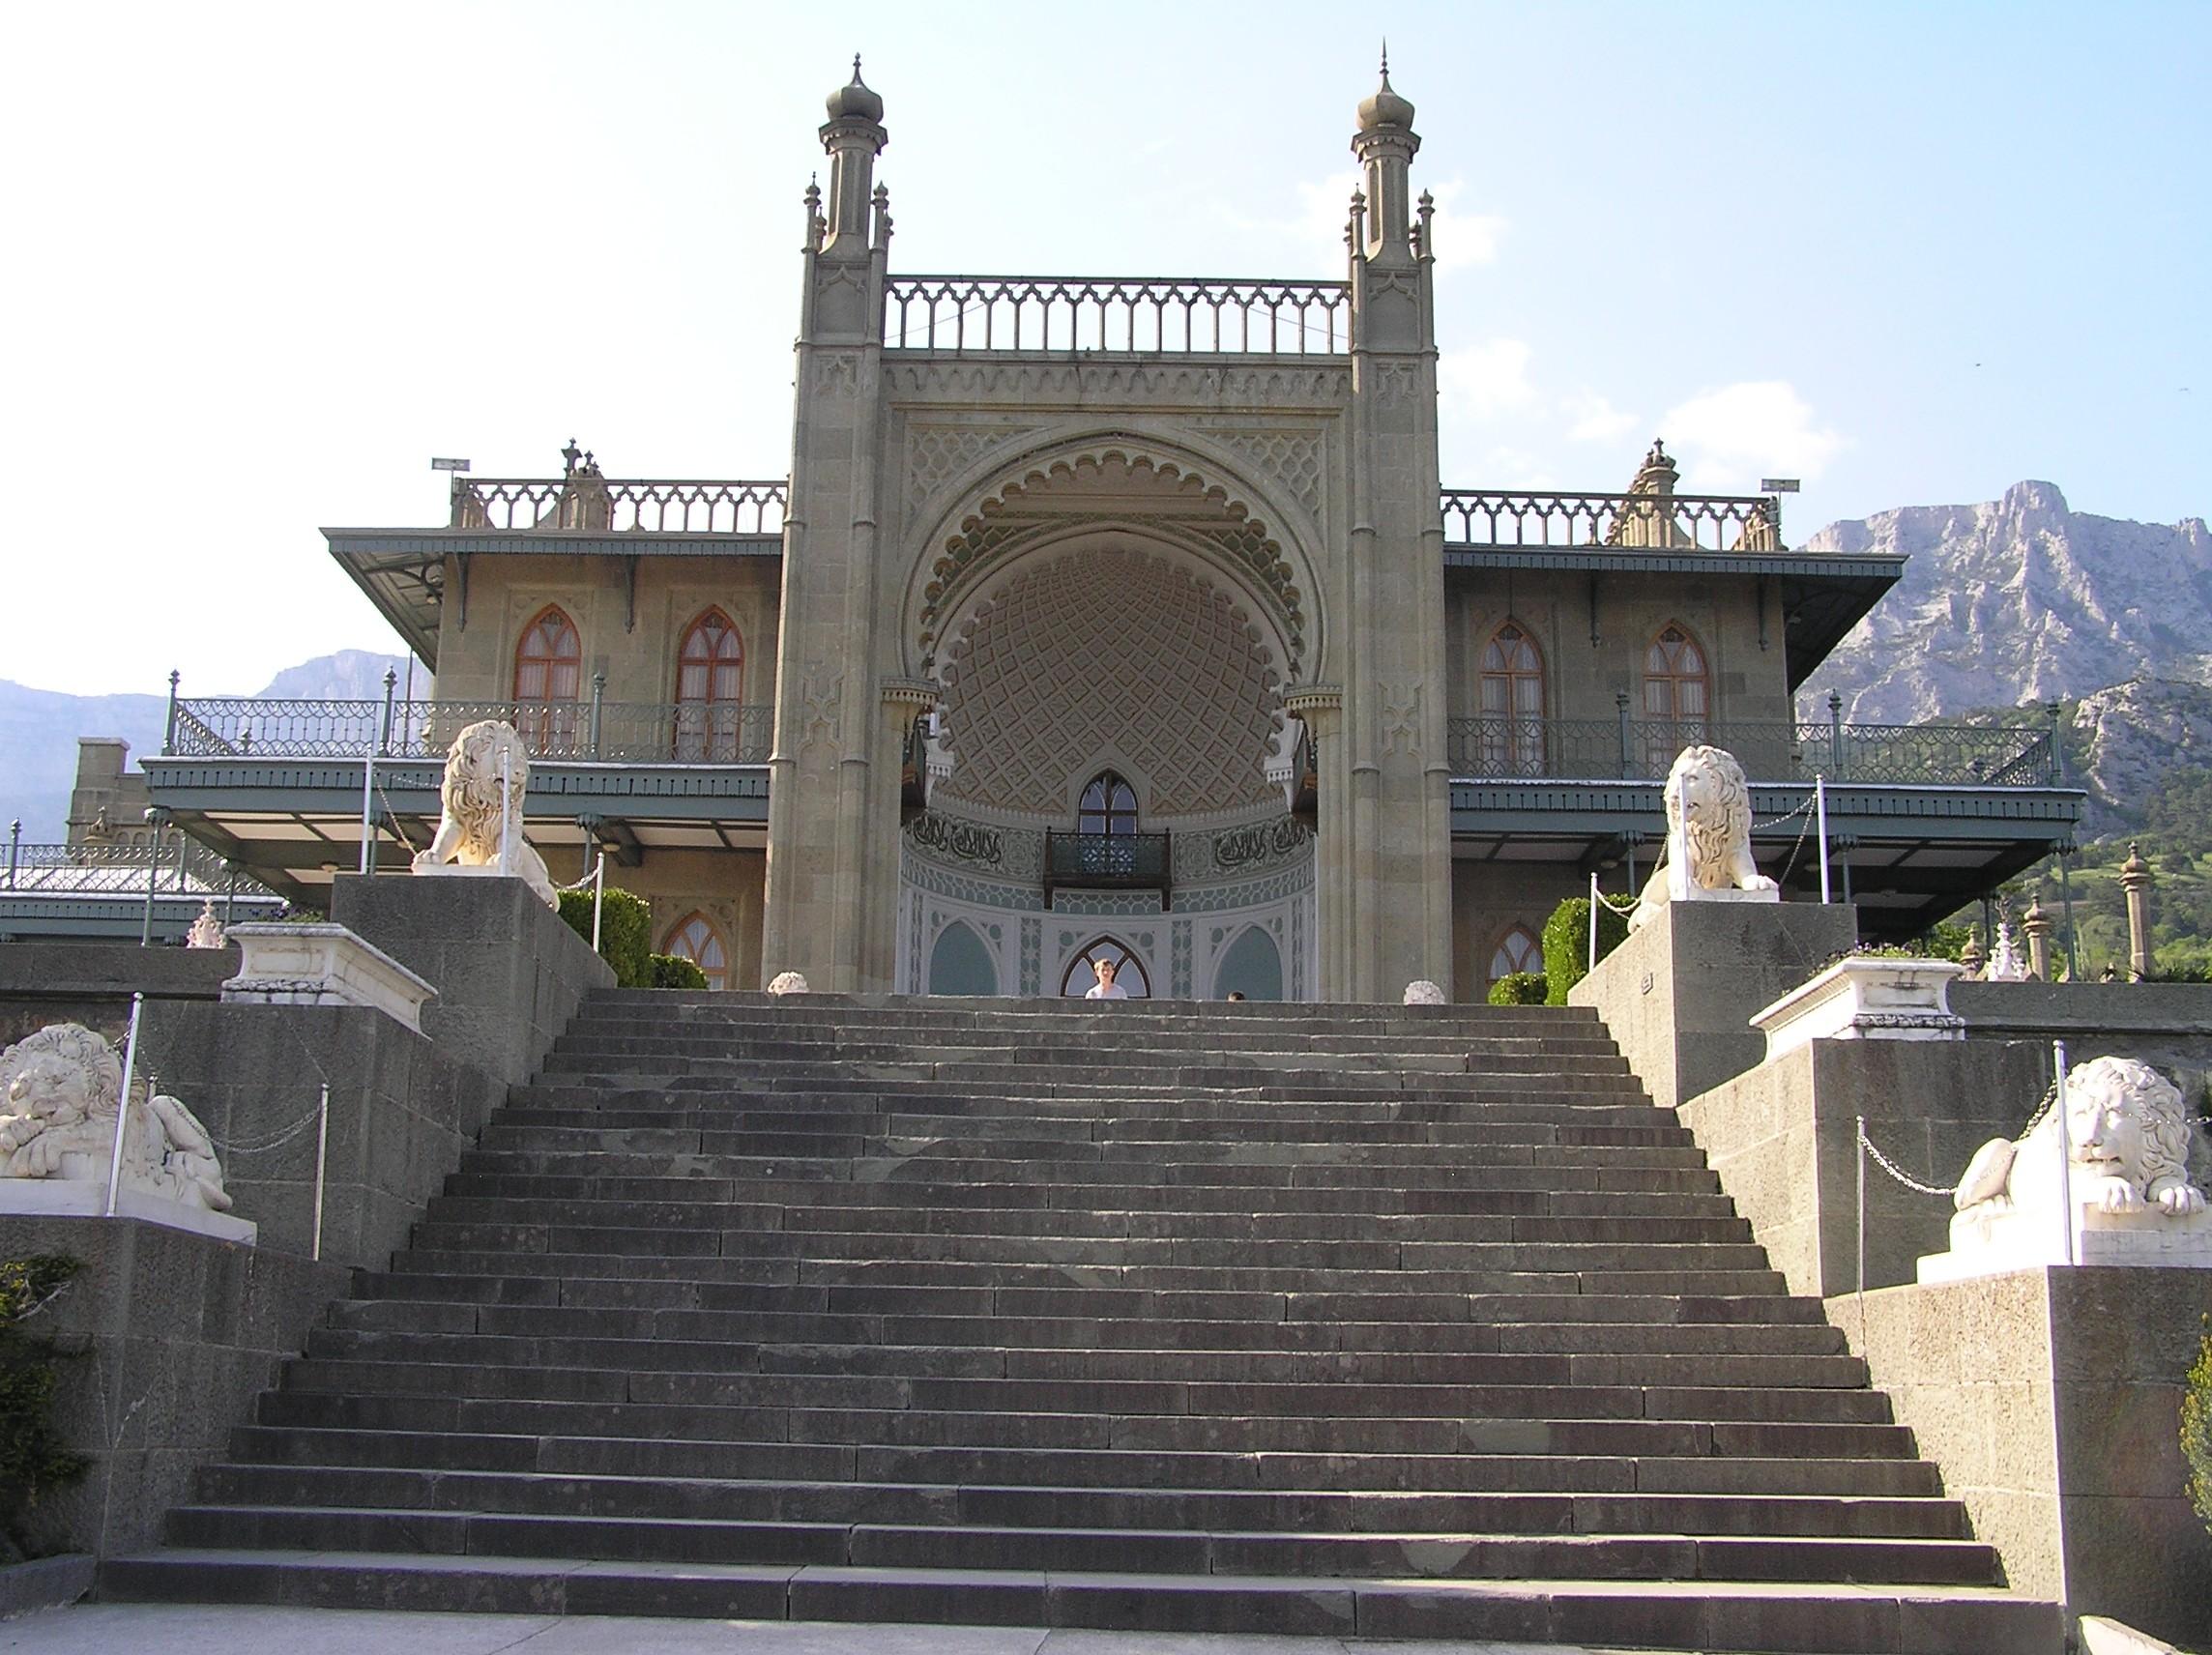 Фото: Комплекс дворцов Крыма